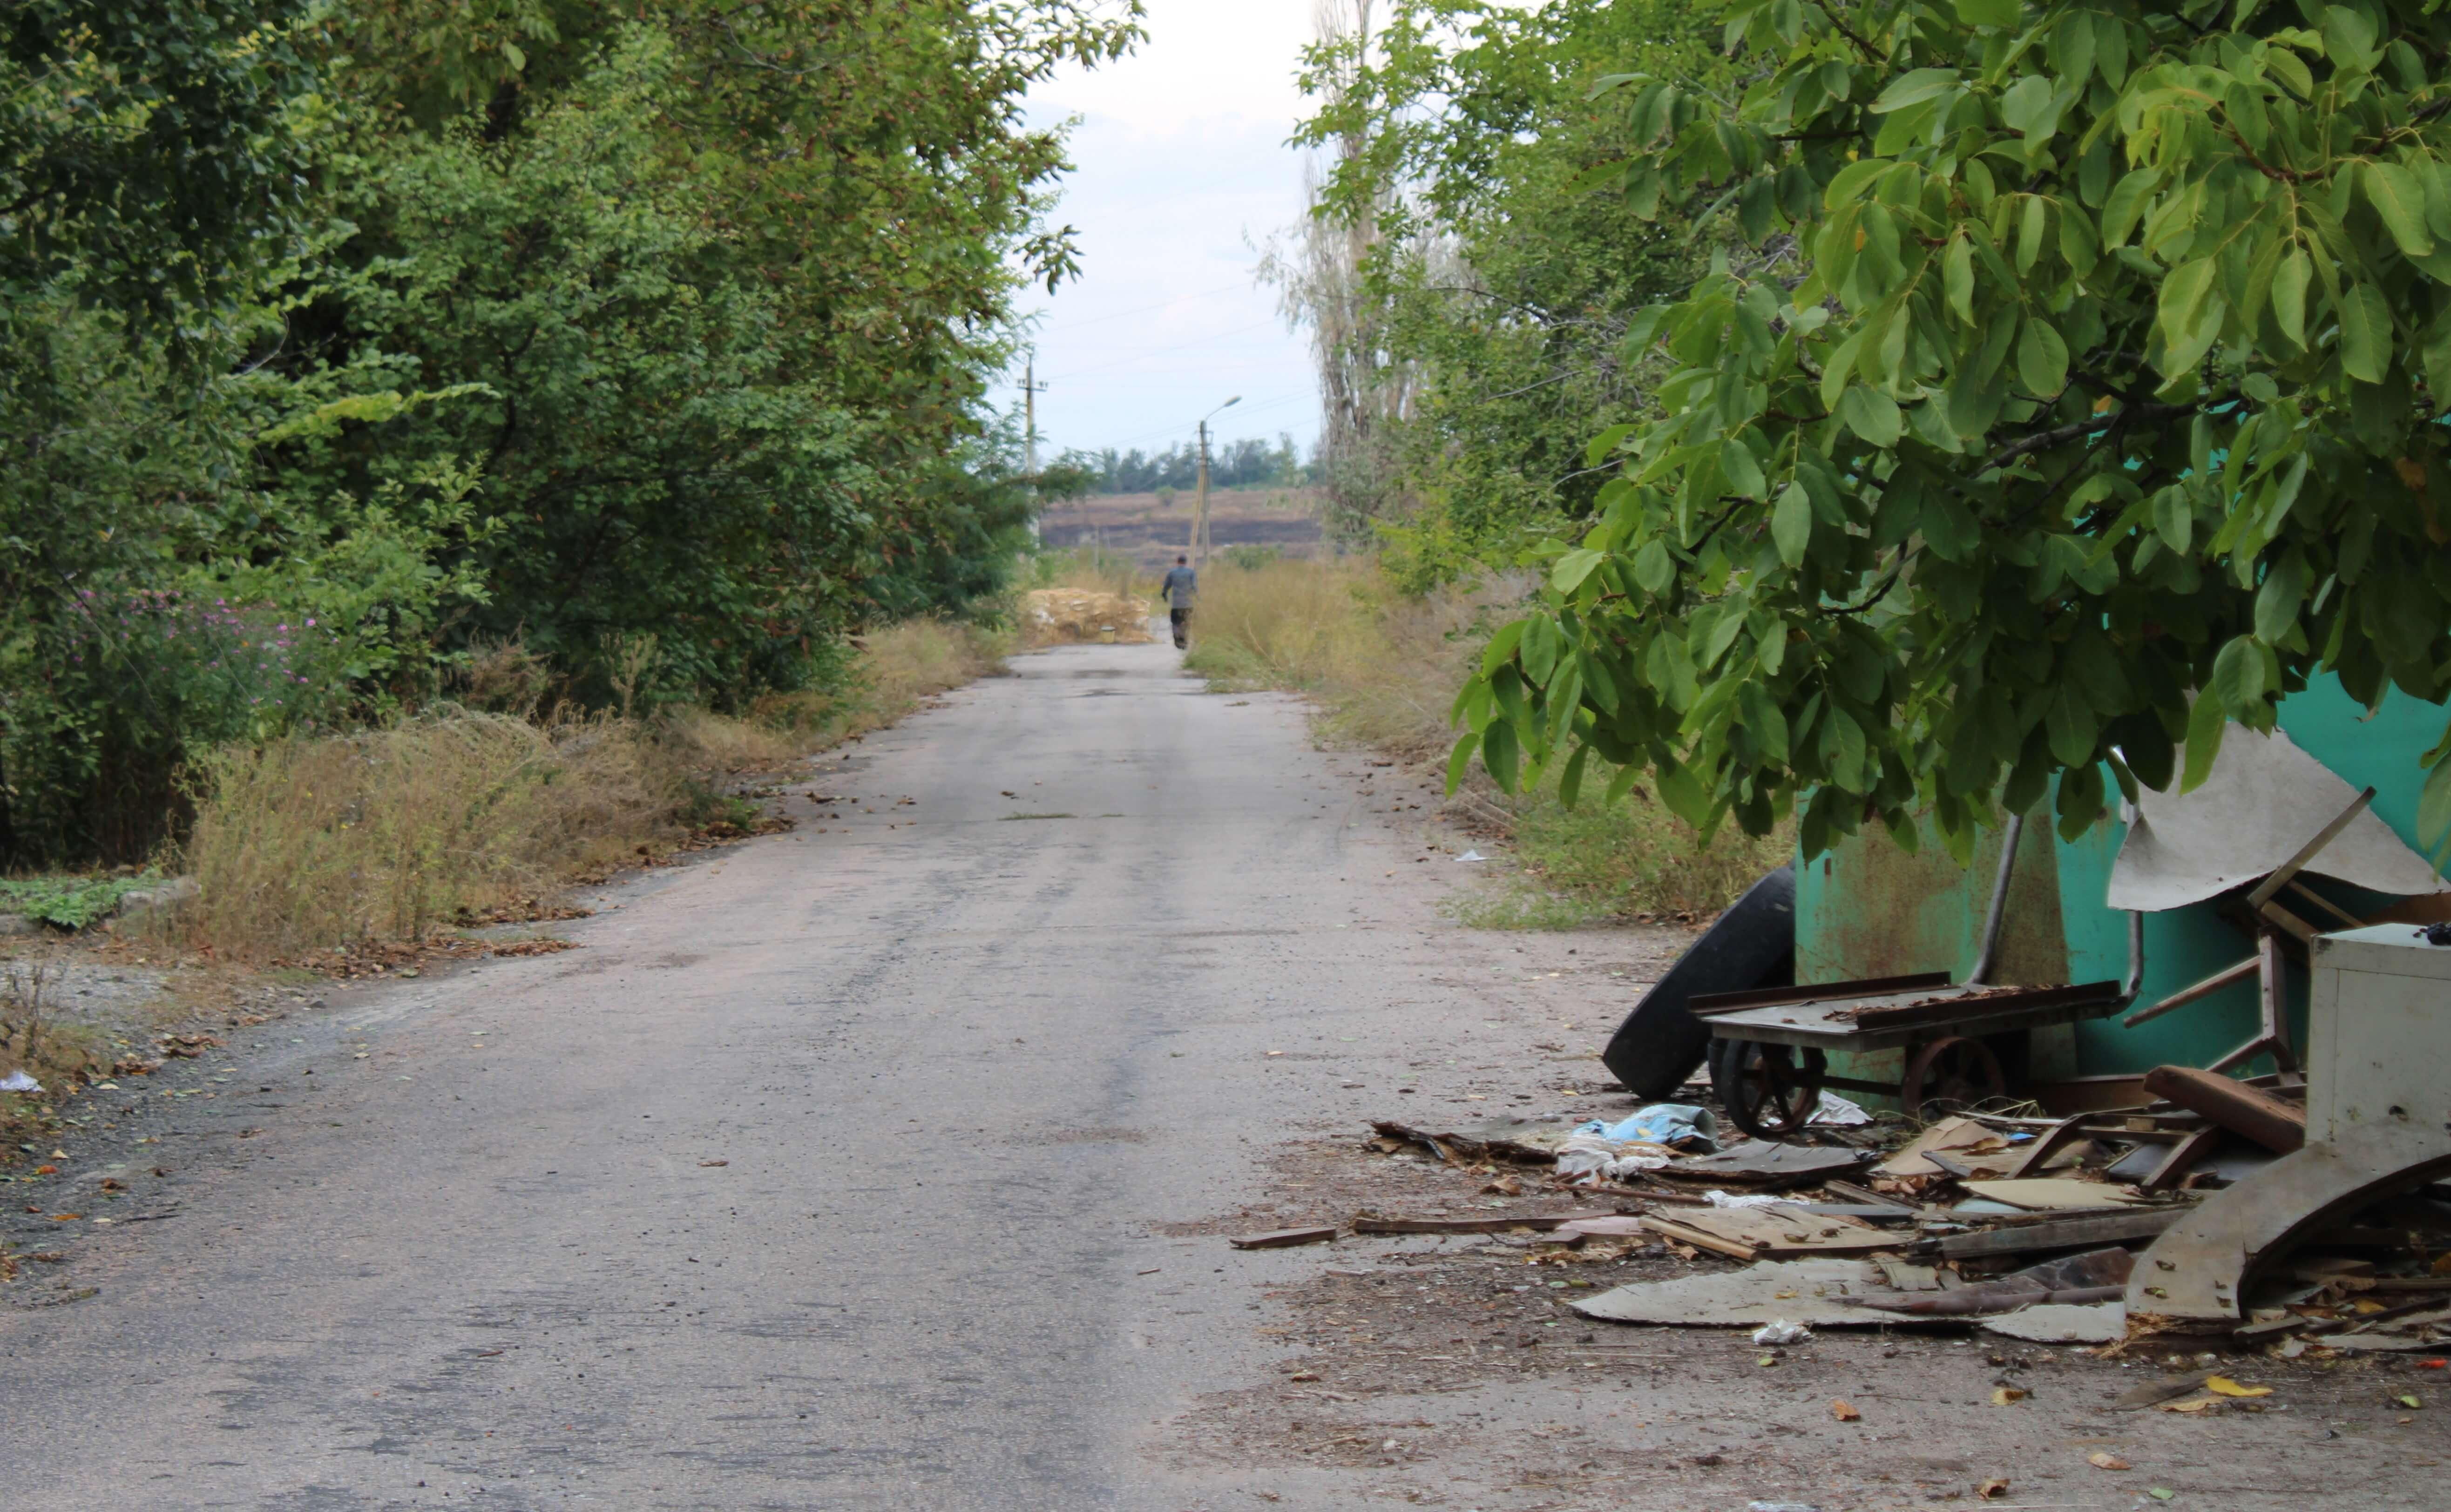 Donbass War Diary sniper